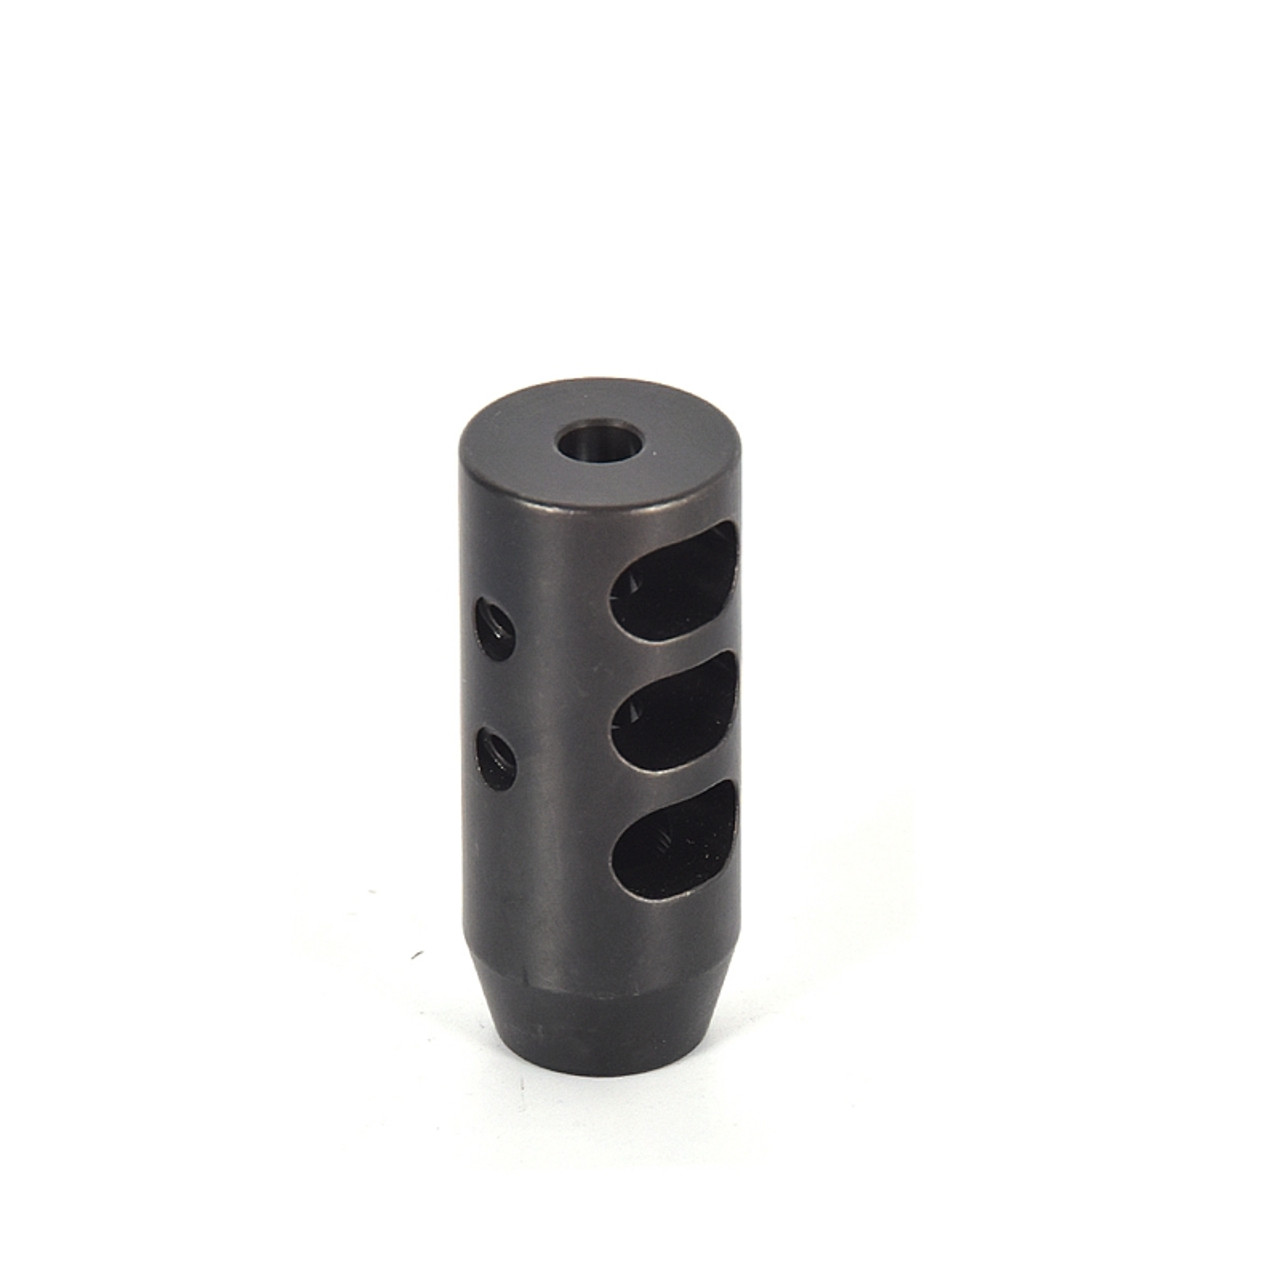 3 Port Muzzle Brake 5/8x24 .308-7.62